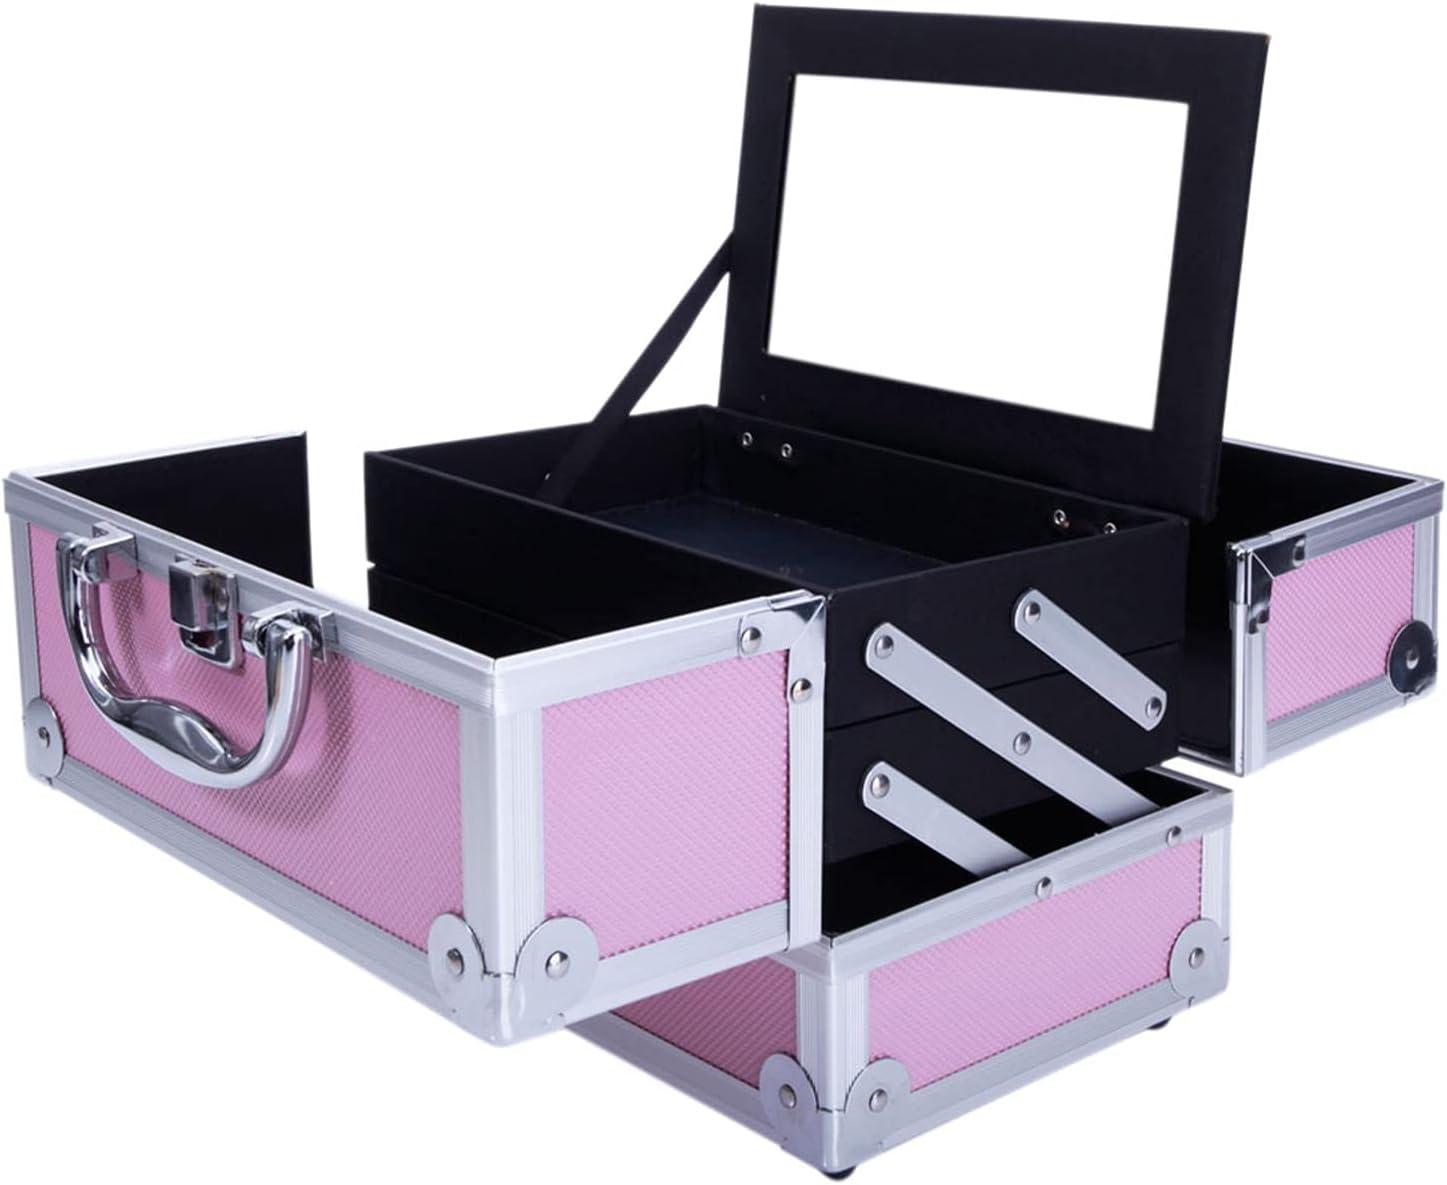 Makeup Train Spasm price Case Portable Cosmetic Louisville-Jefferson County Mall Jewelry Box Lockab Organizer